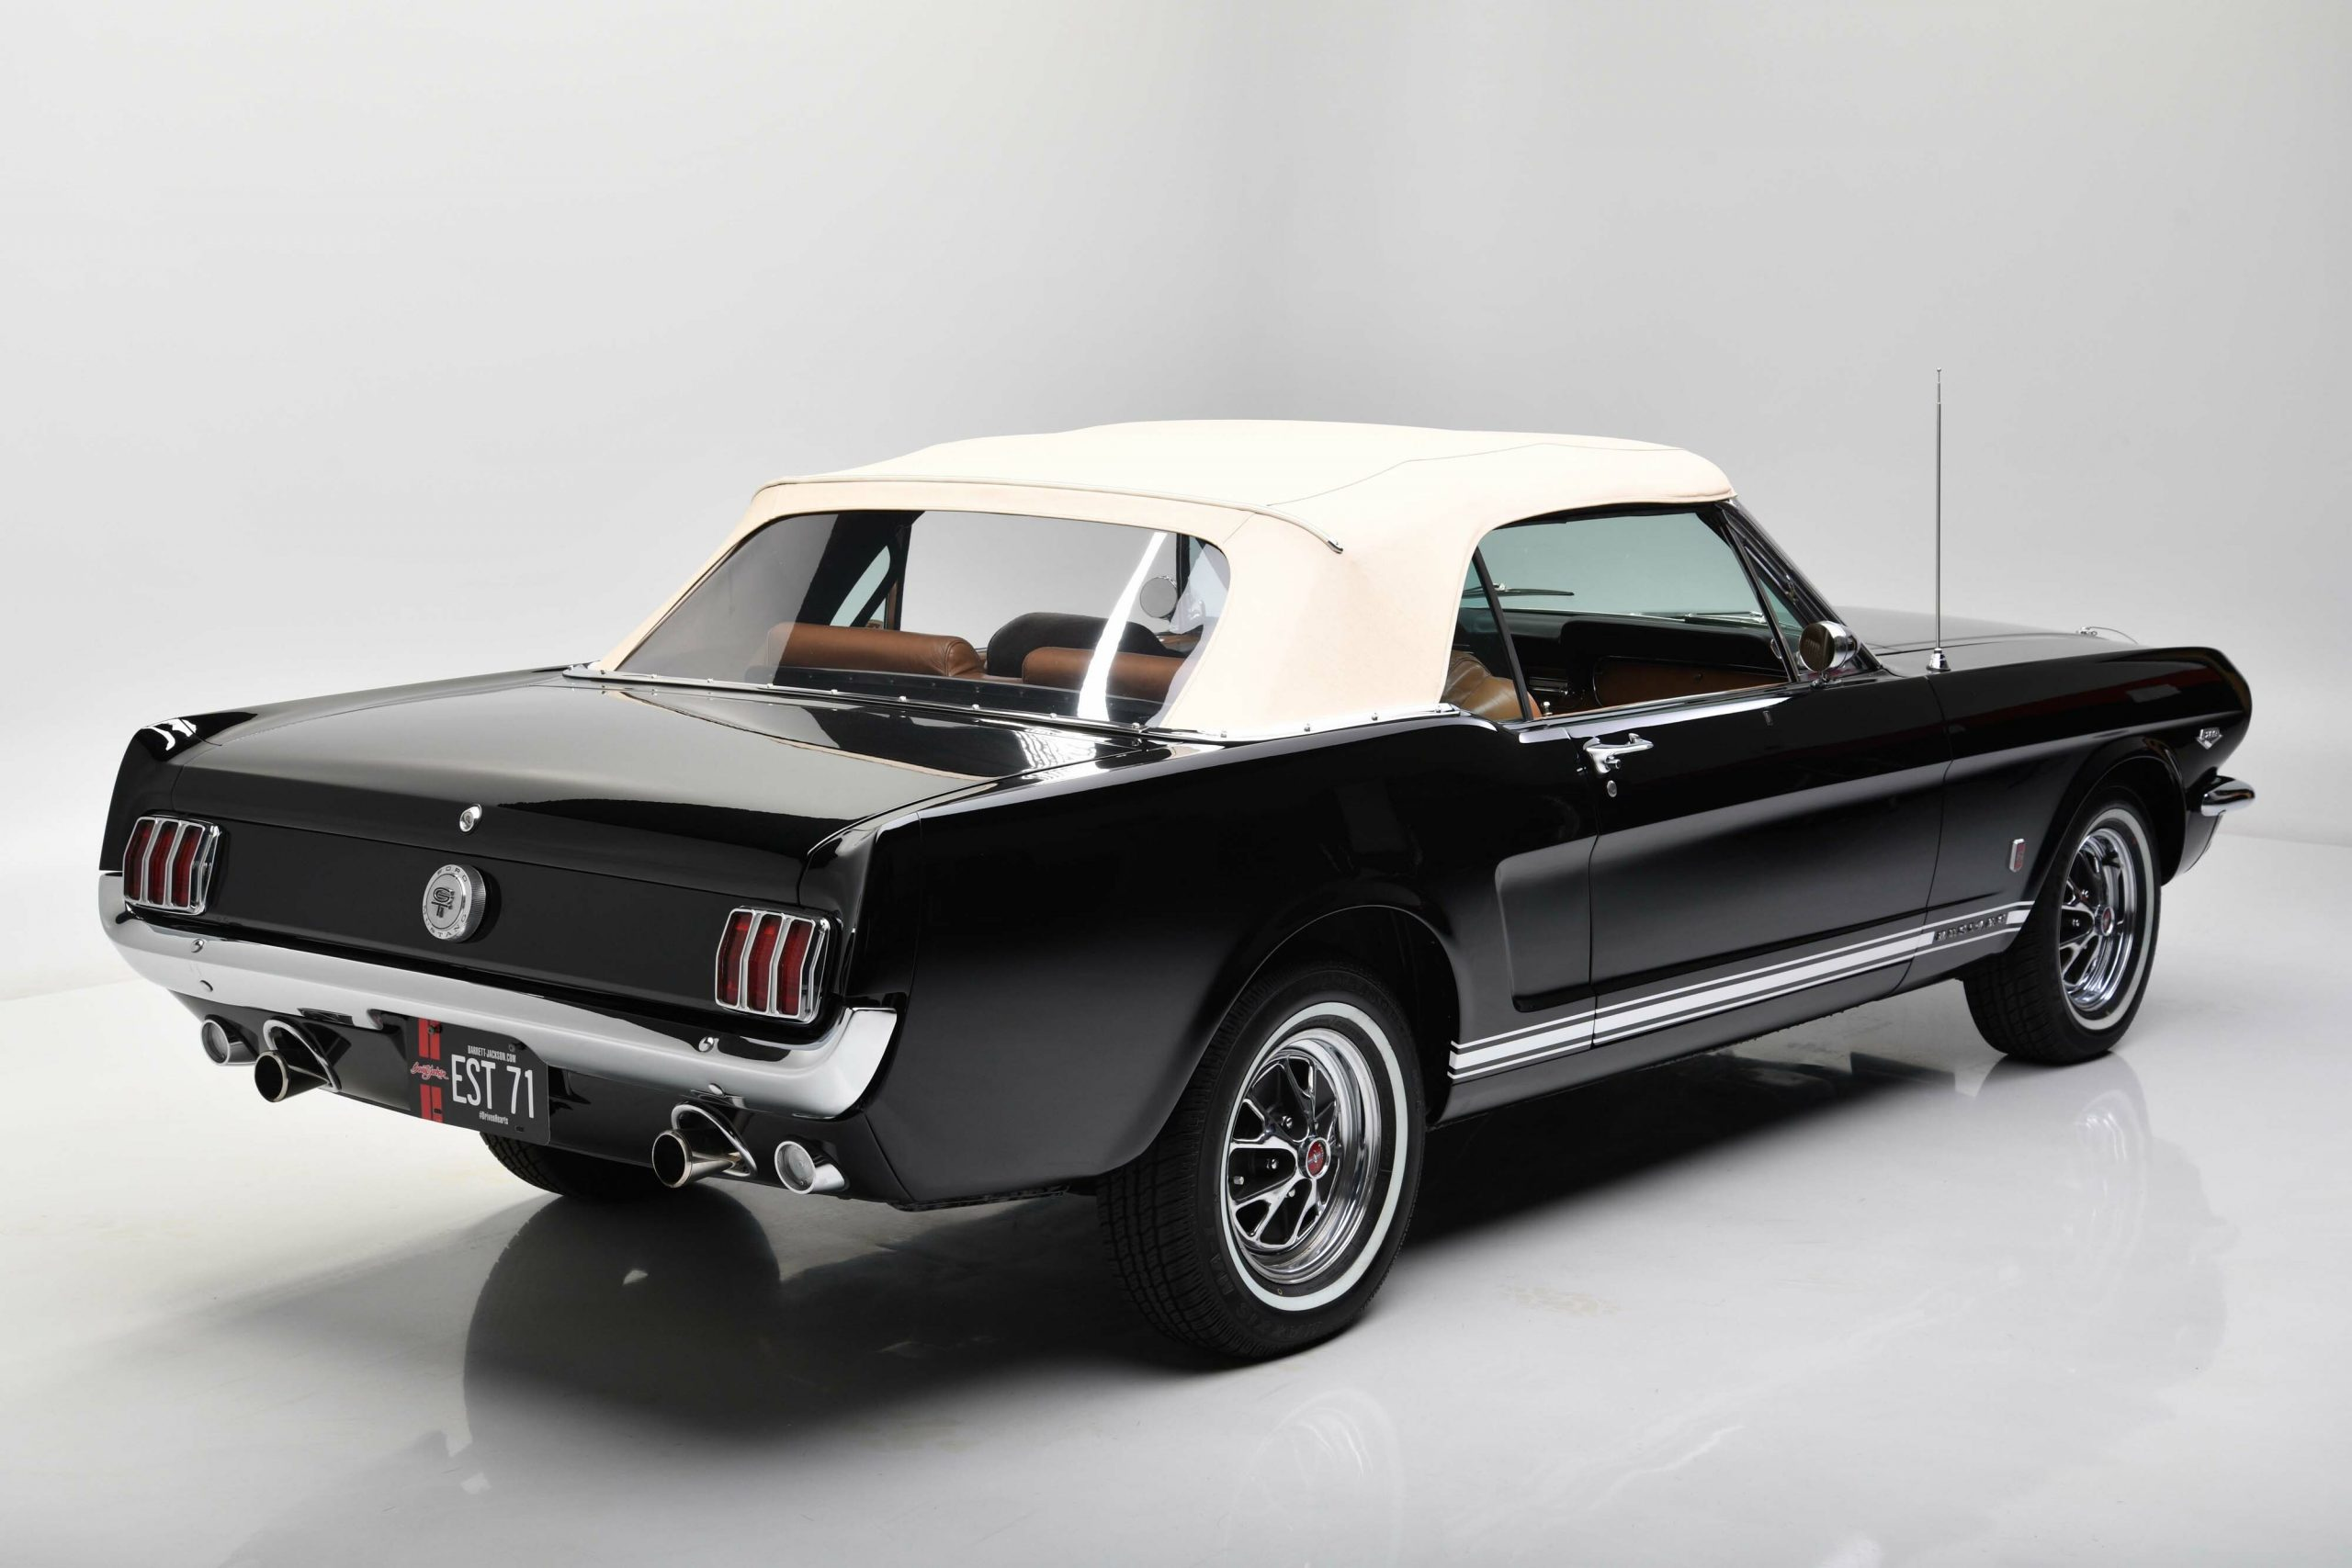 1966 FORD MUSTANG GT K-CODE CONVERTIBLE rear three-quarter